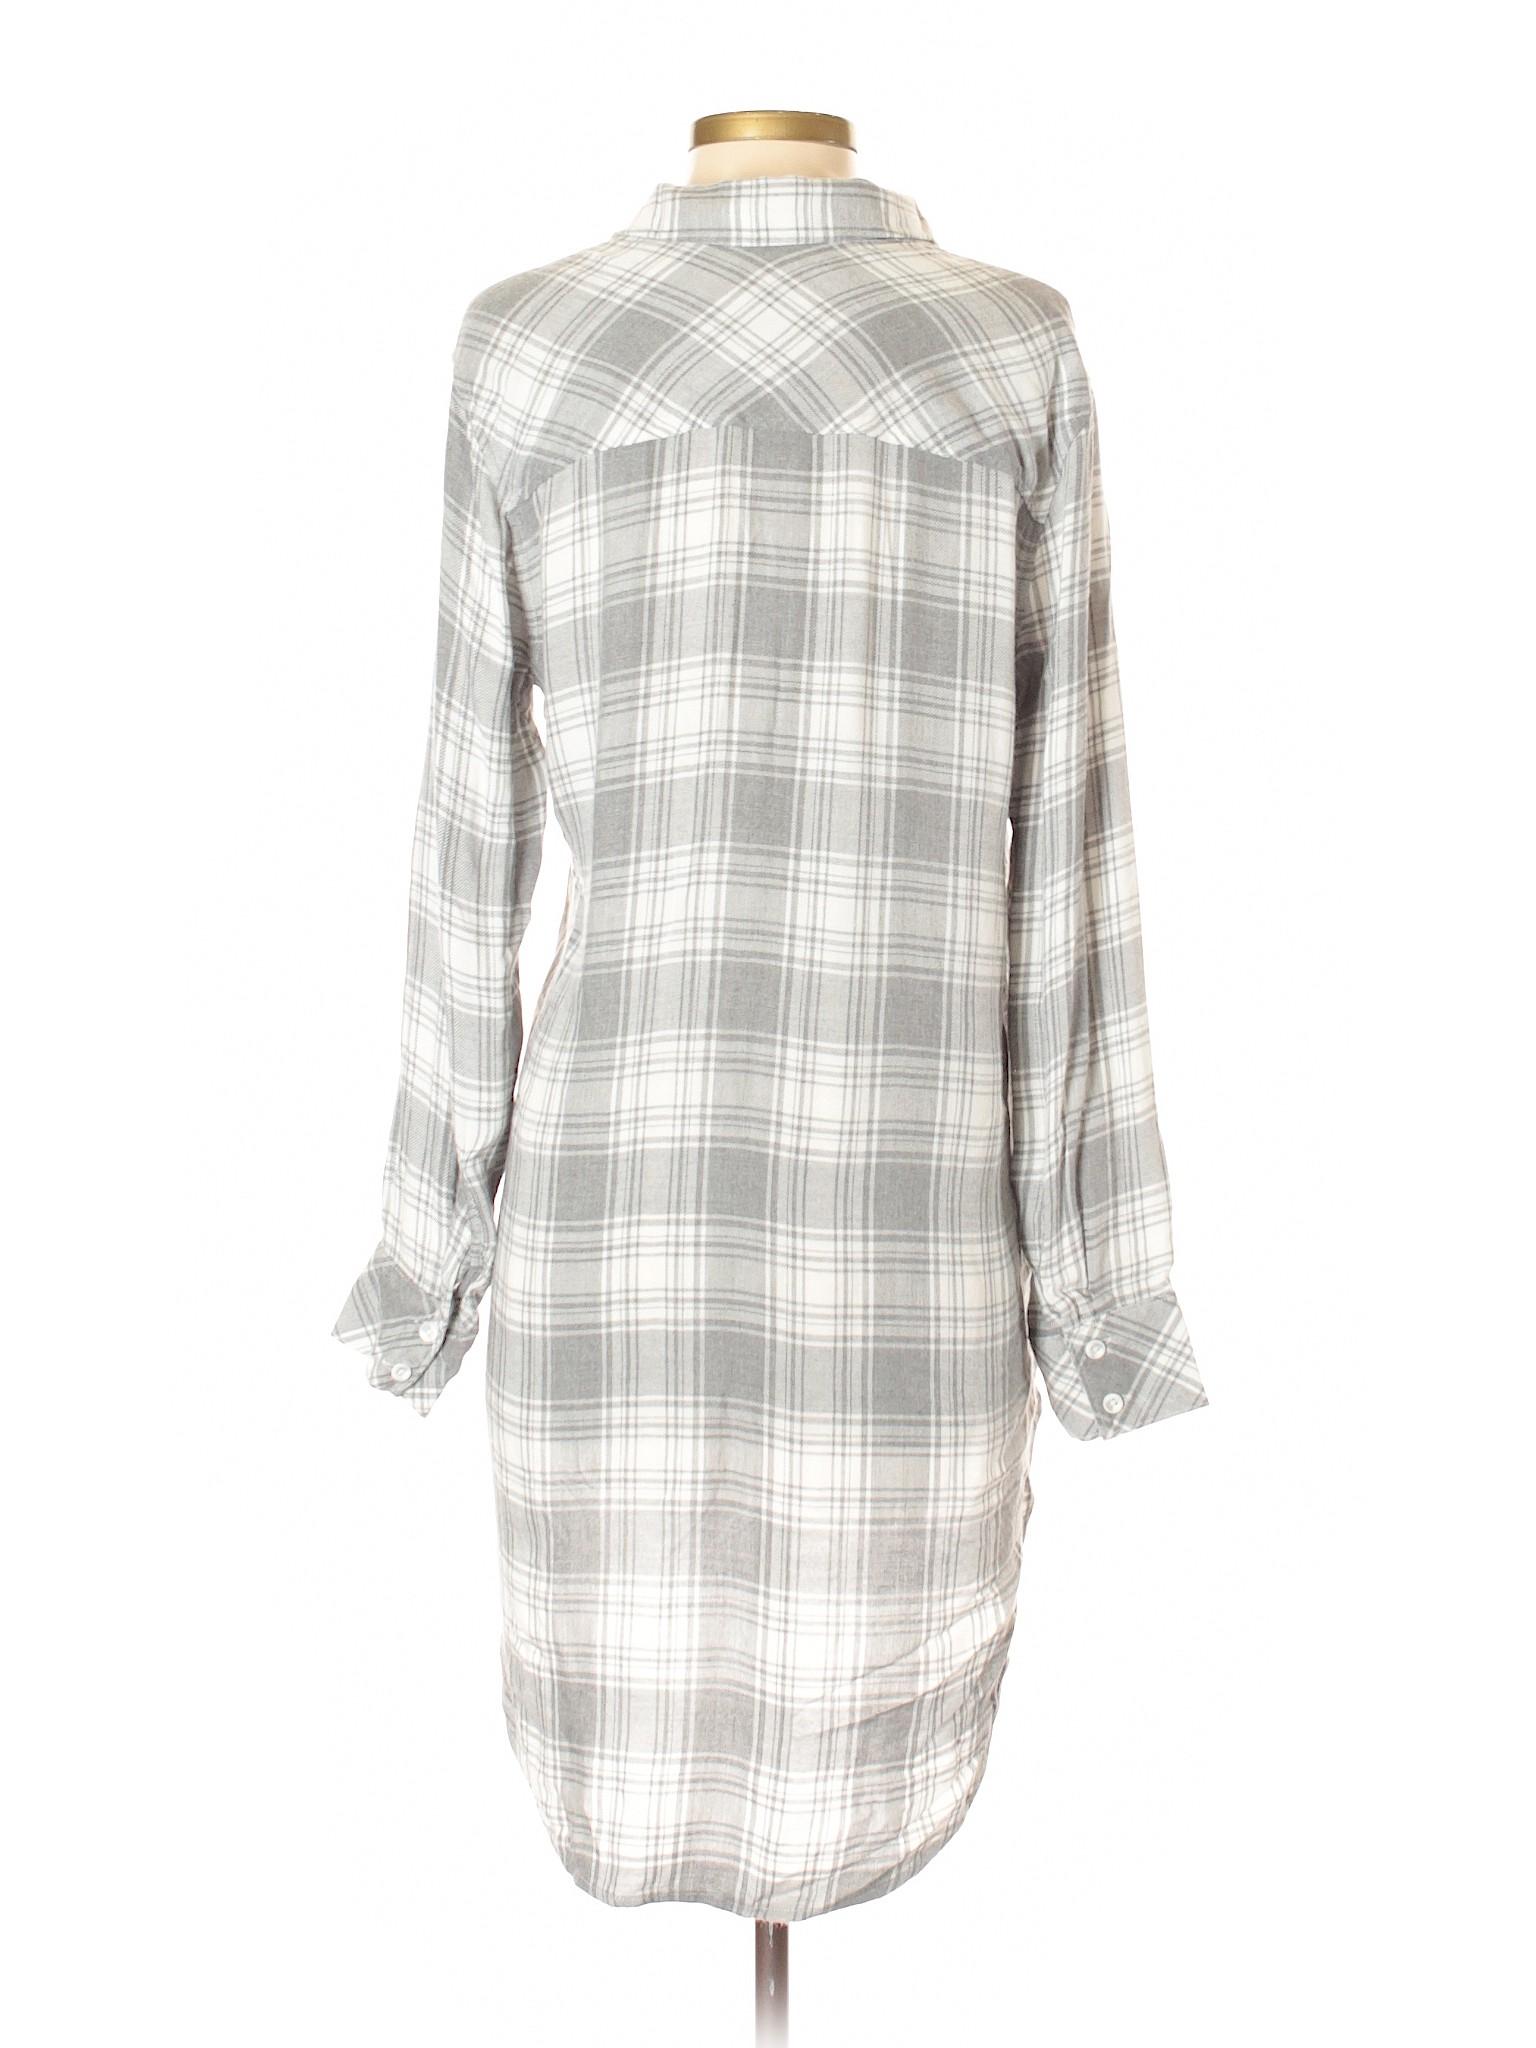 Boutique Dahl Dress Bella Casual winter rq6xIwE4rW